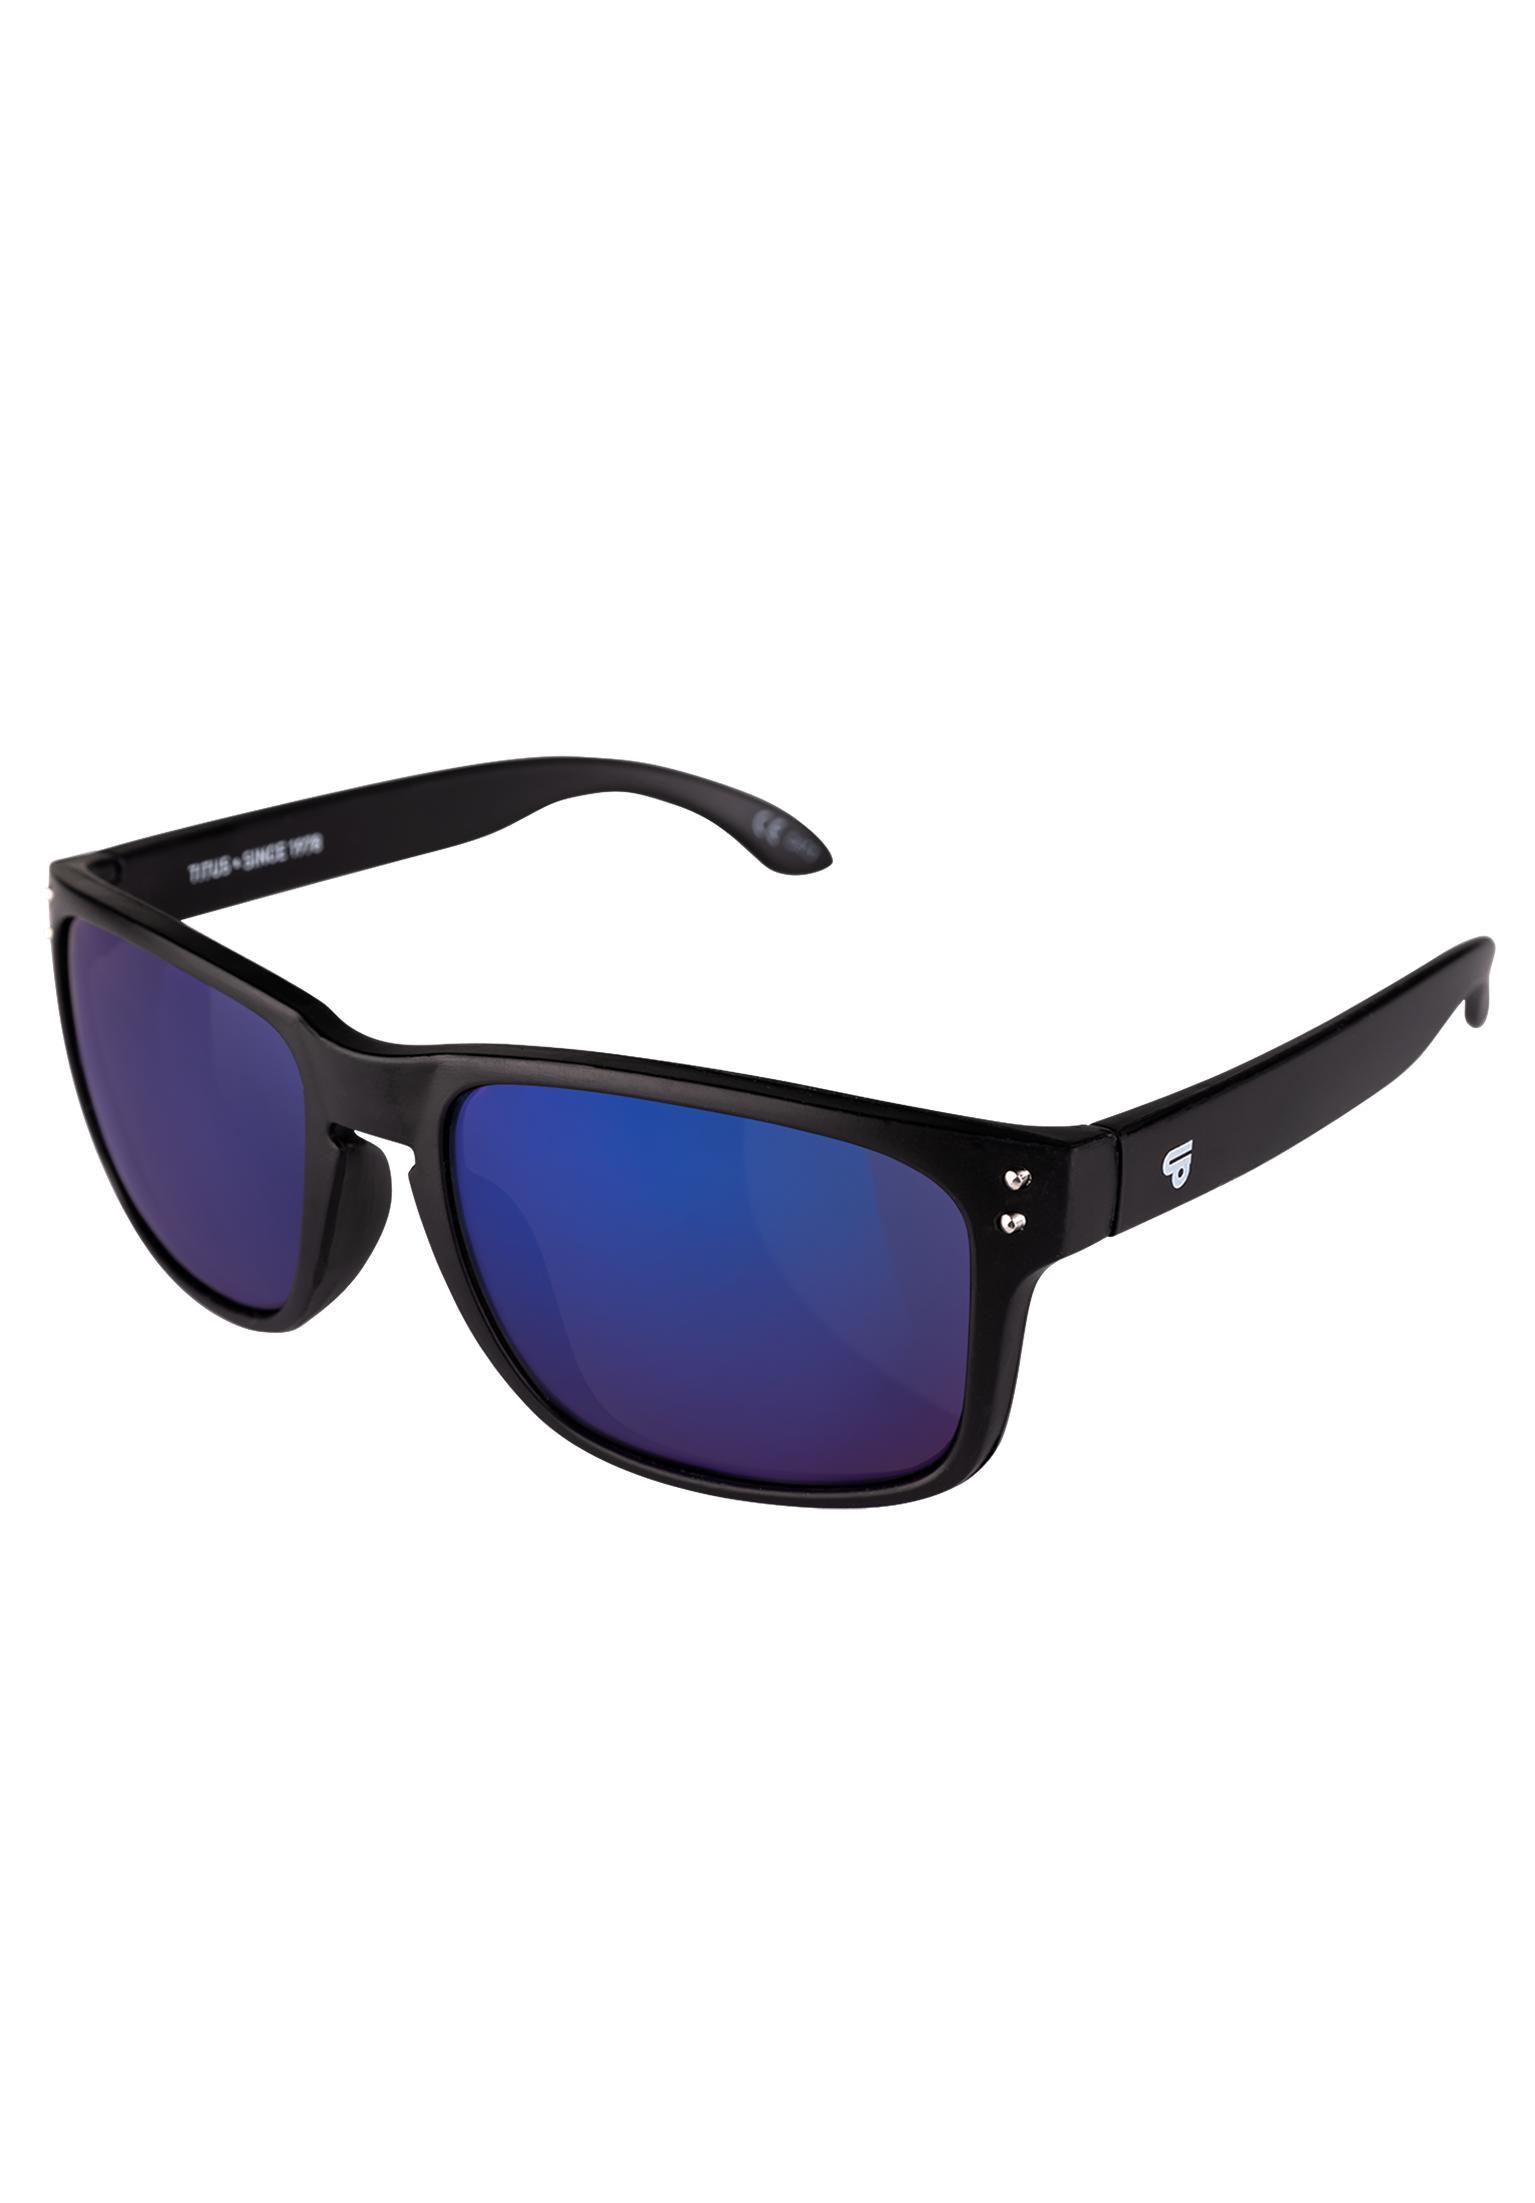 Etnies Sonnenbrille Sunglasses Black